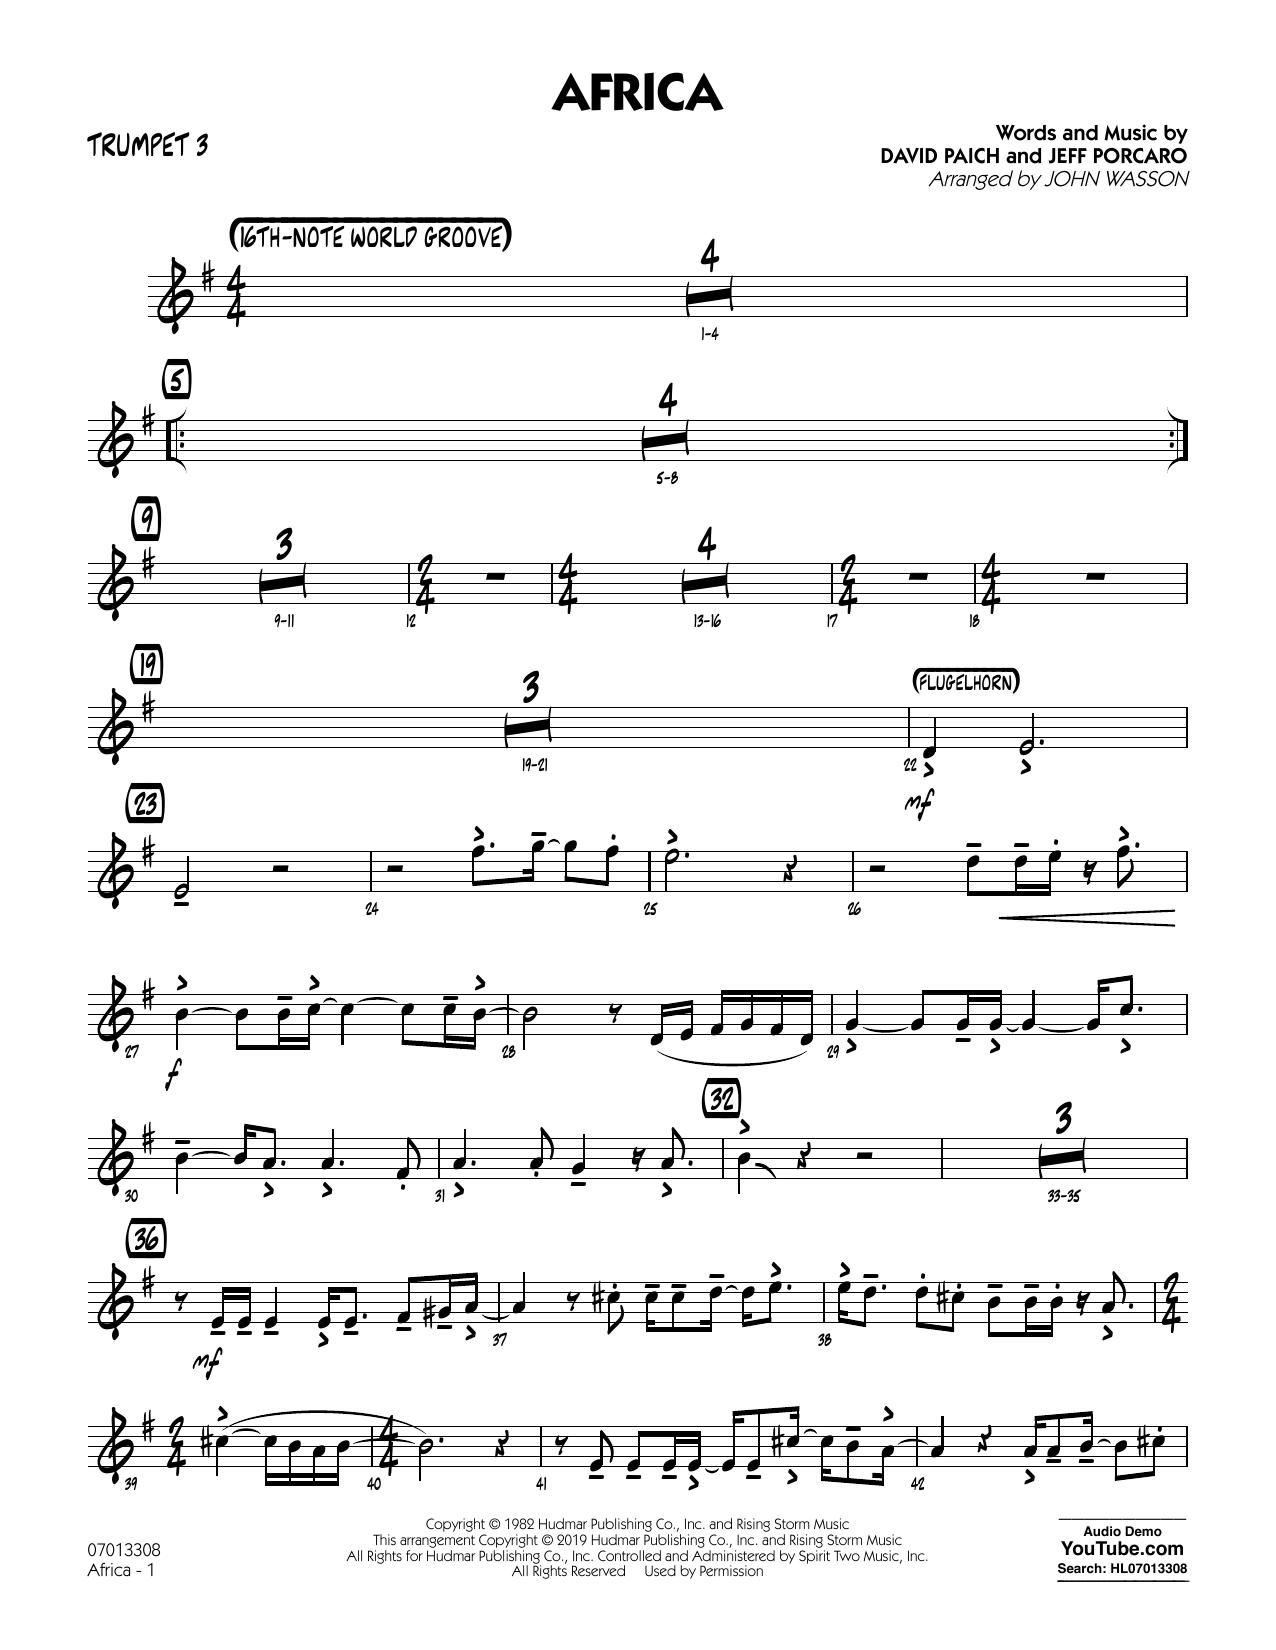 Africa (arr. John Wasson) - Trumpet 3 (Jazz Ensemble)